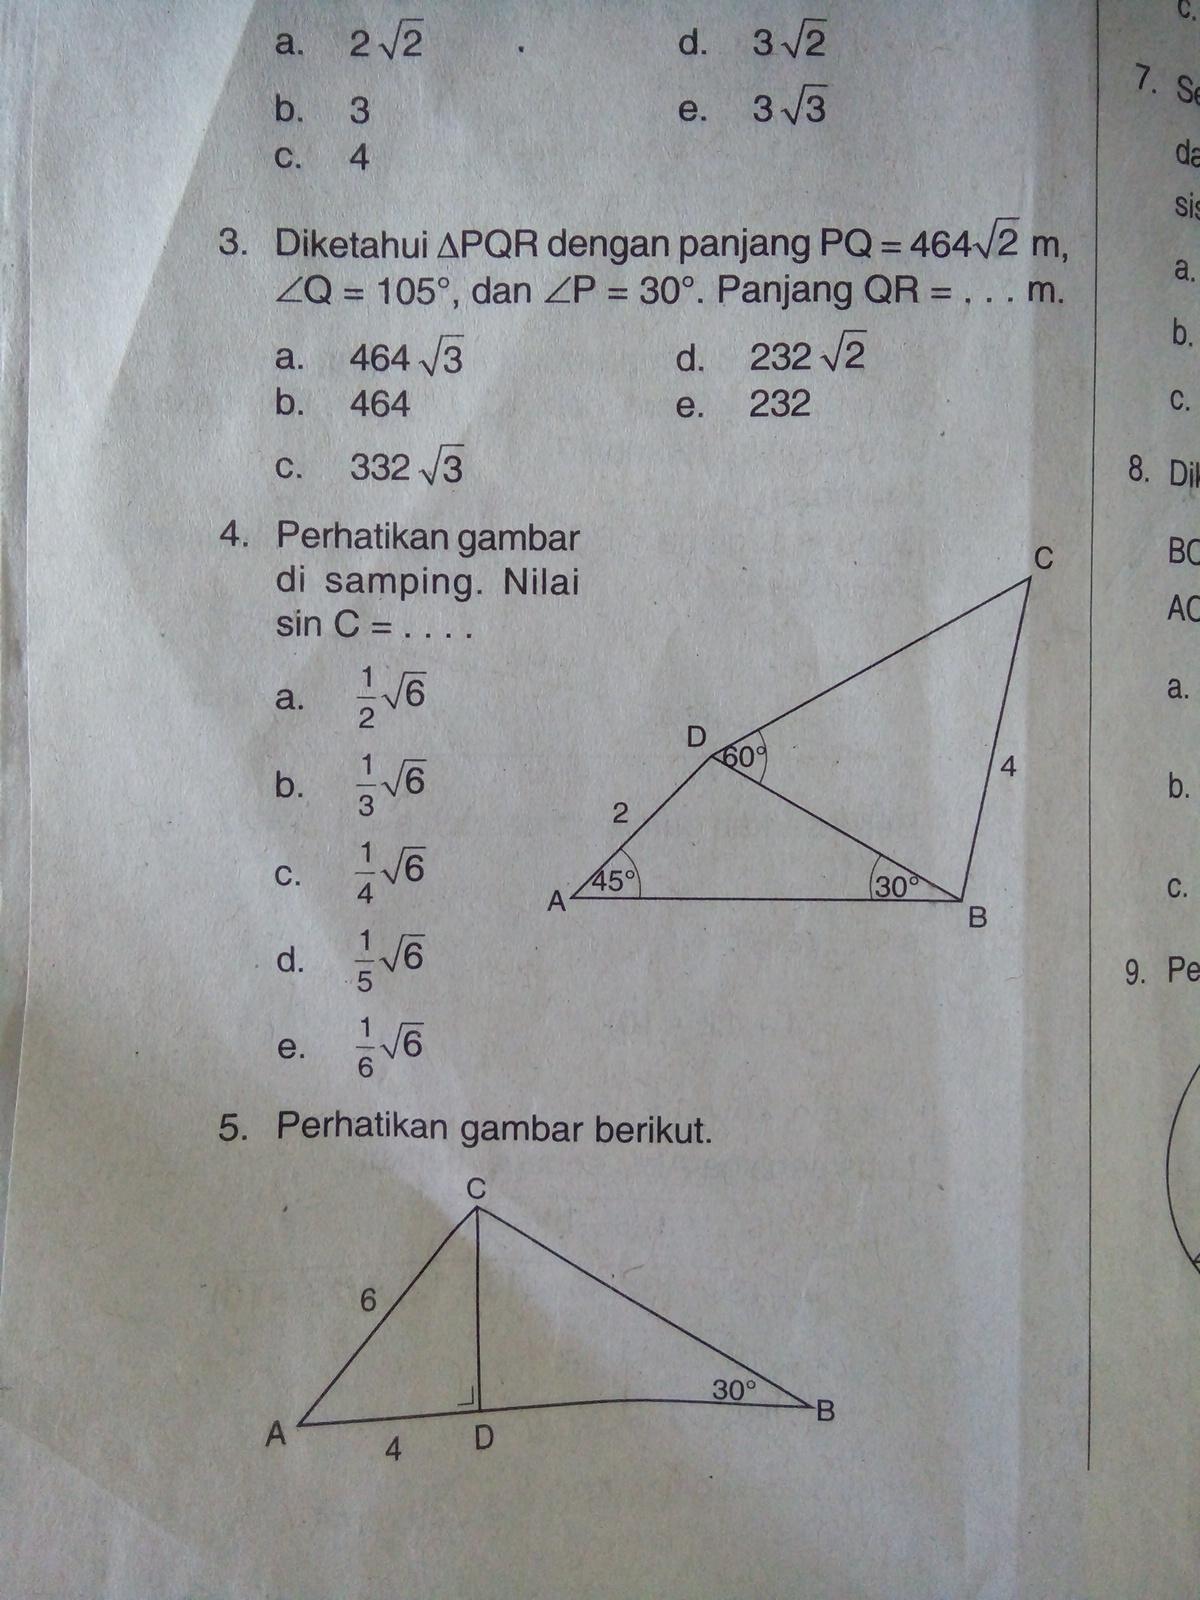 Luas Segitiga Trigonometri : segitiga, trigonometri, Tolong, Berikan, Caranya, Trigonometri, Segitiga, Brainly.co.id